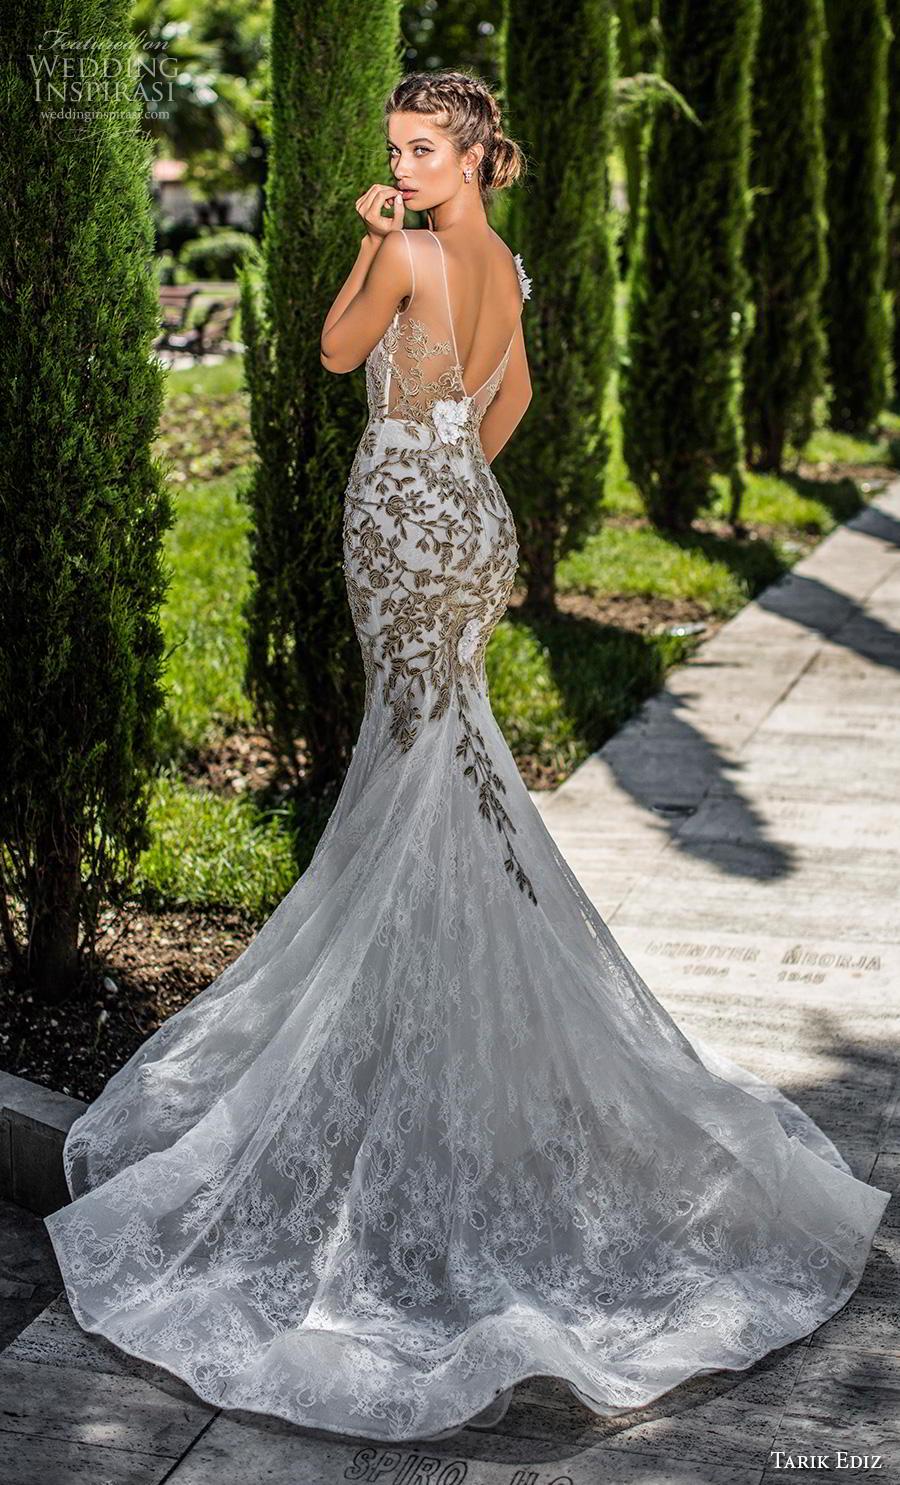 tarik ediz 2019 bridal cap sleeves illusion boat deep plunging sweetheart neckline heavily embellished bodice gold glamorous trumpet wedding dress v back chapel train (10) bv